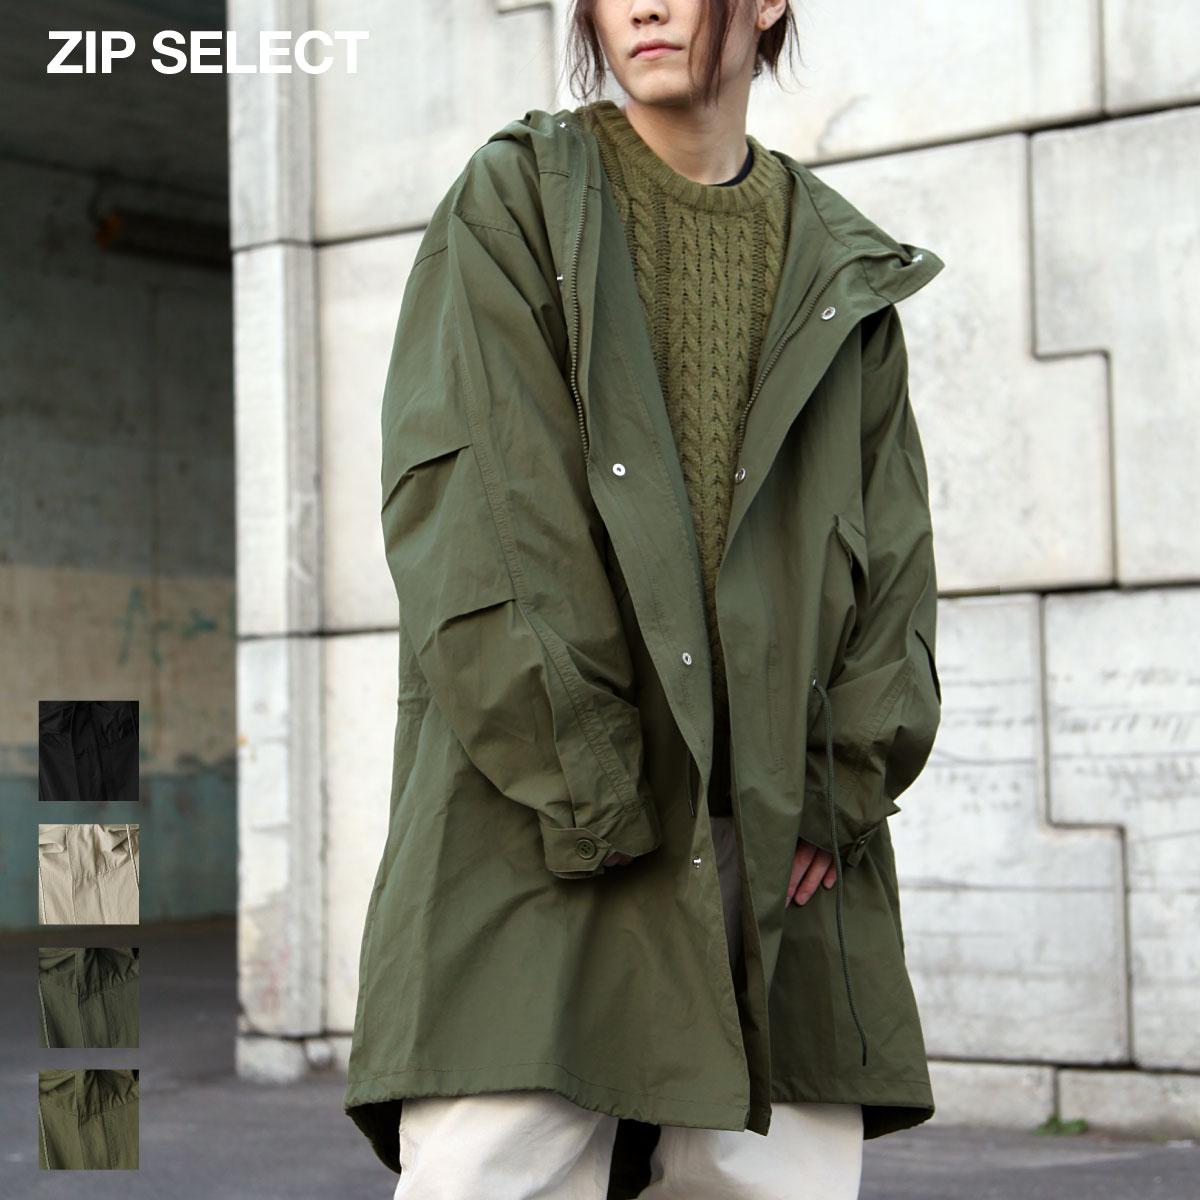 【New】ZIP 摩斯MODS風衣外套 0